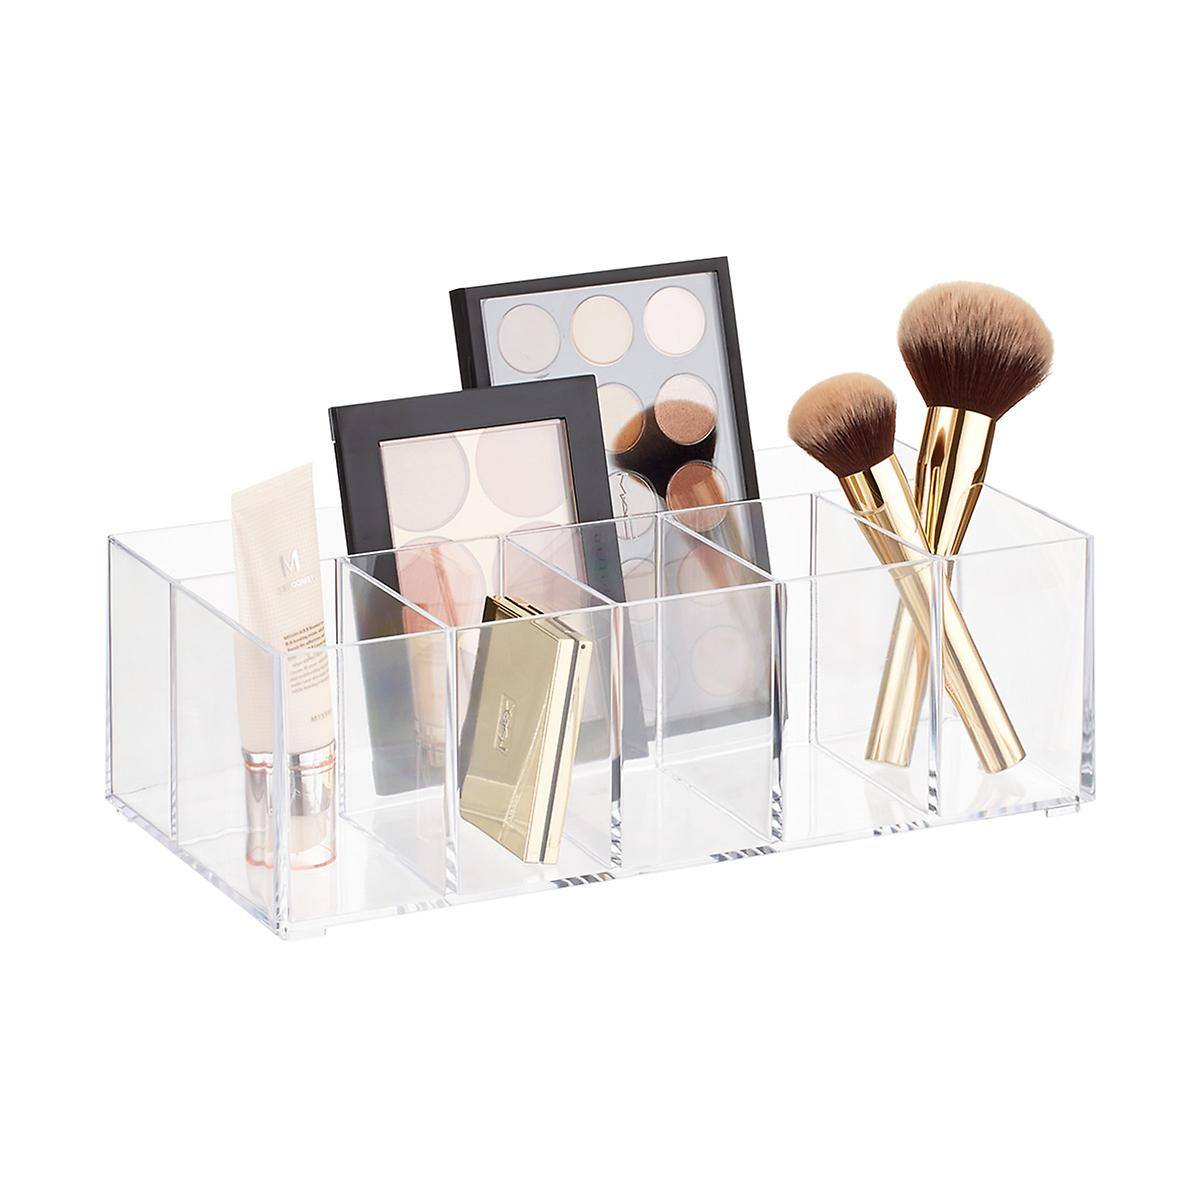 InterDesign Clarity Cosmetics & Vanity Organizer